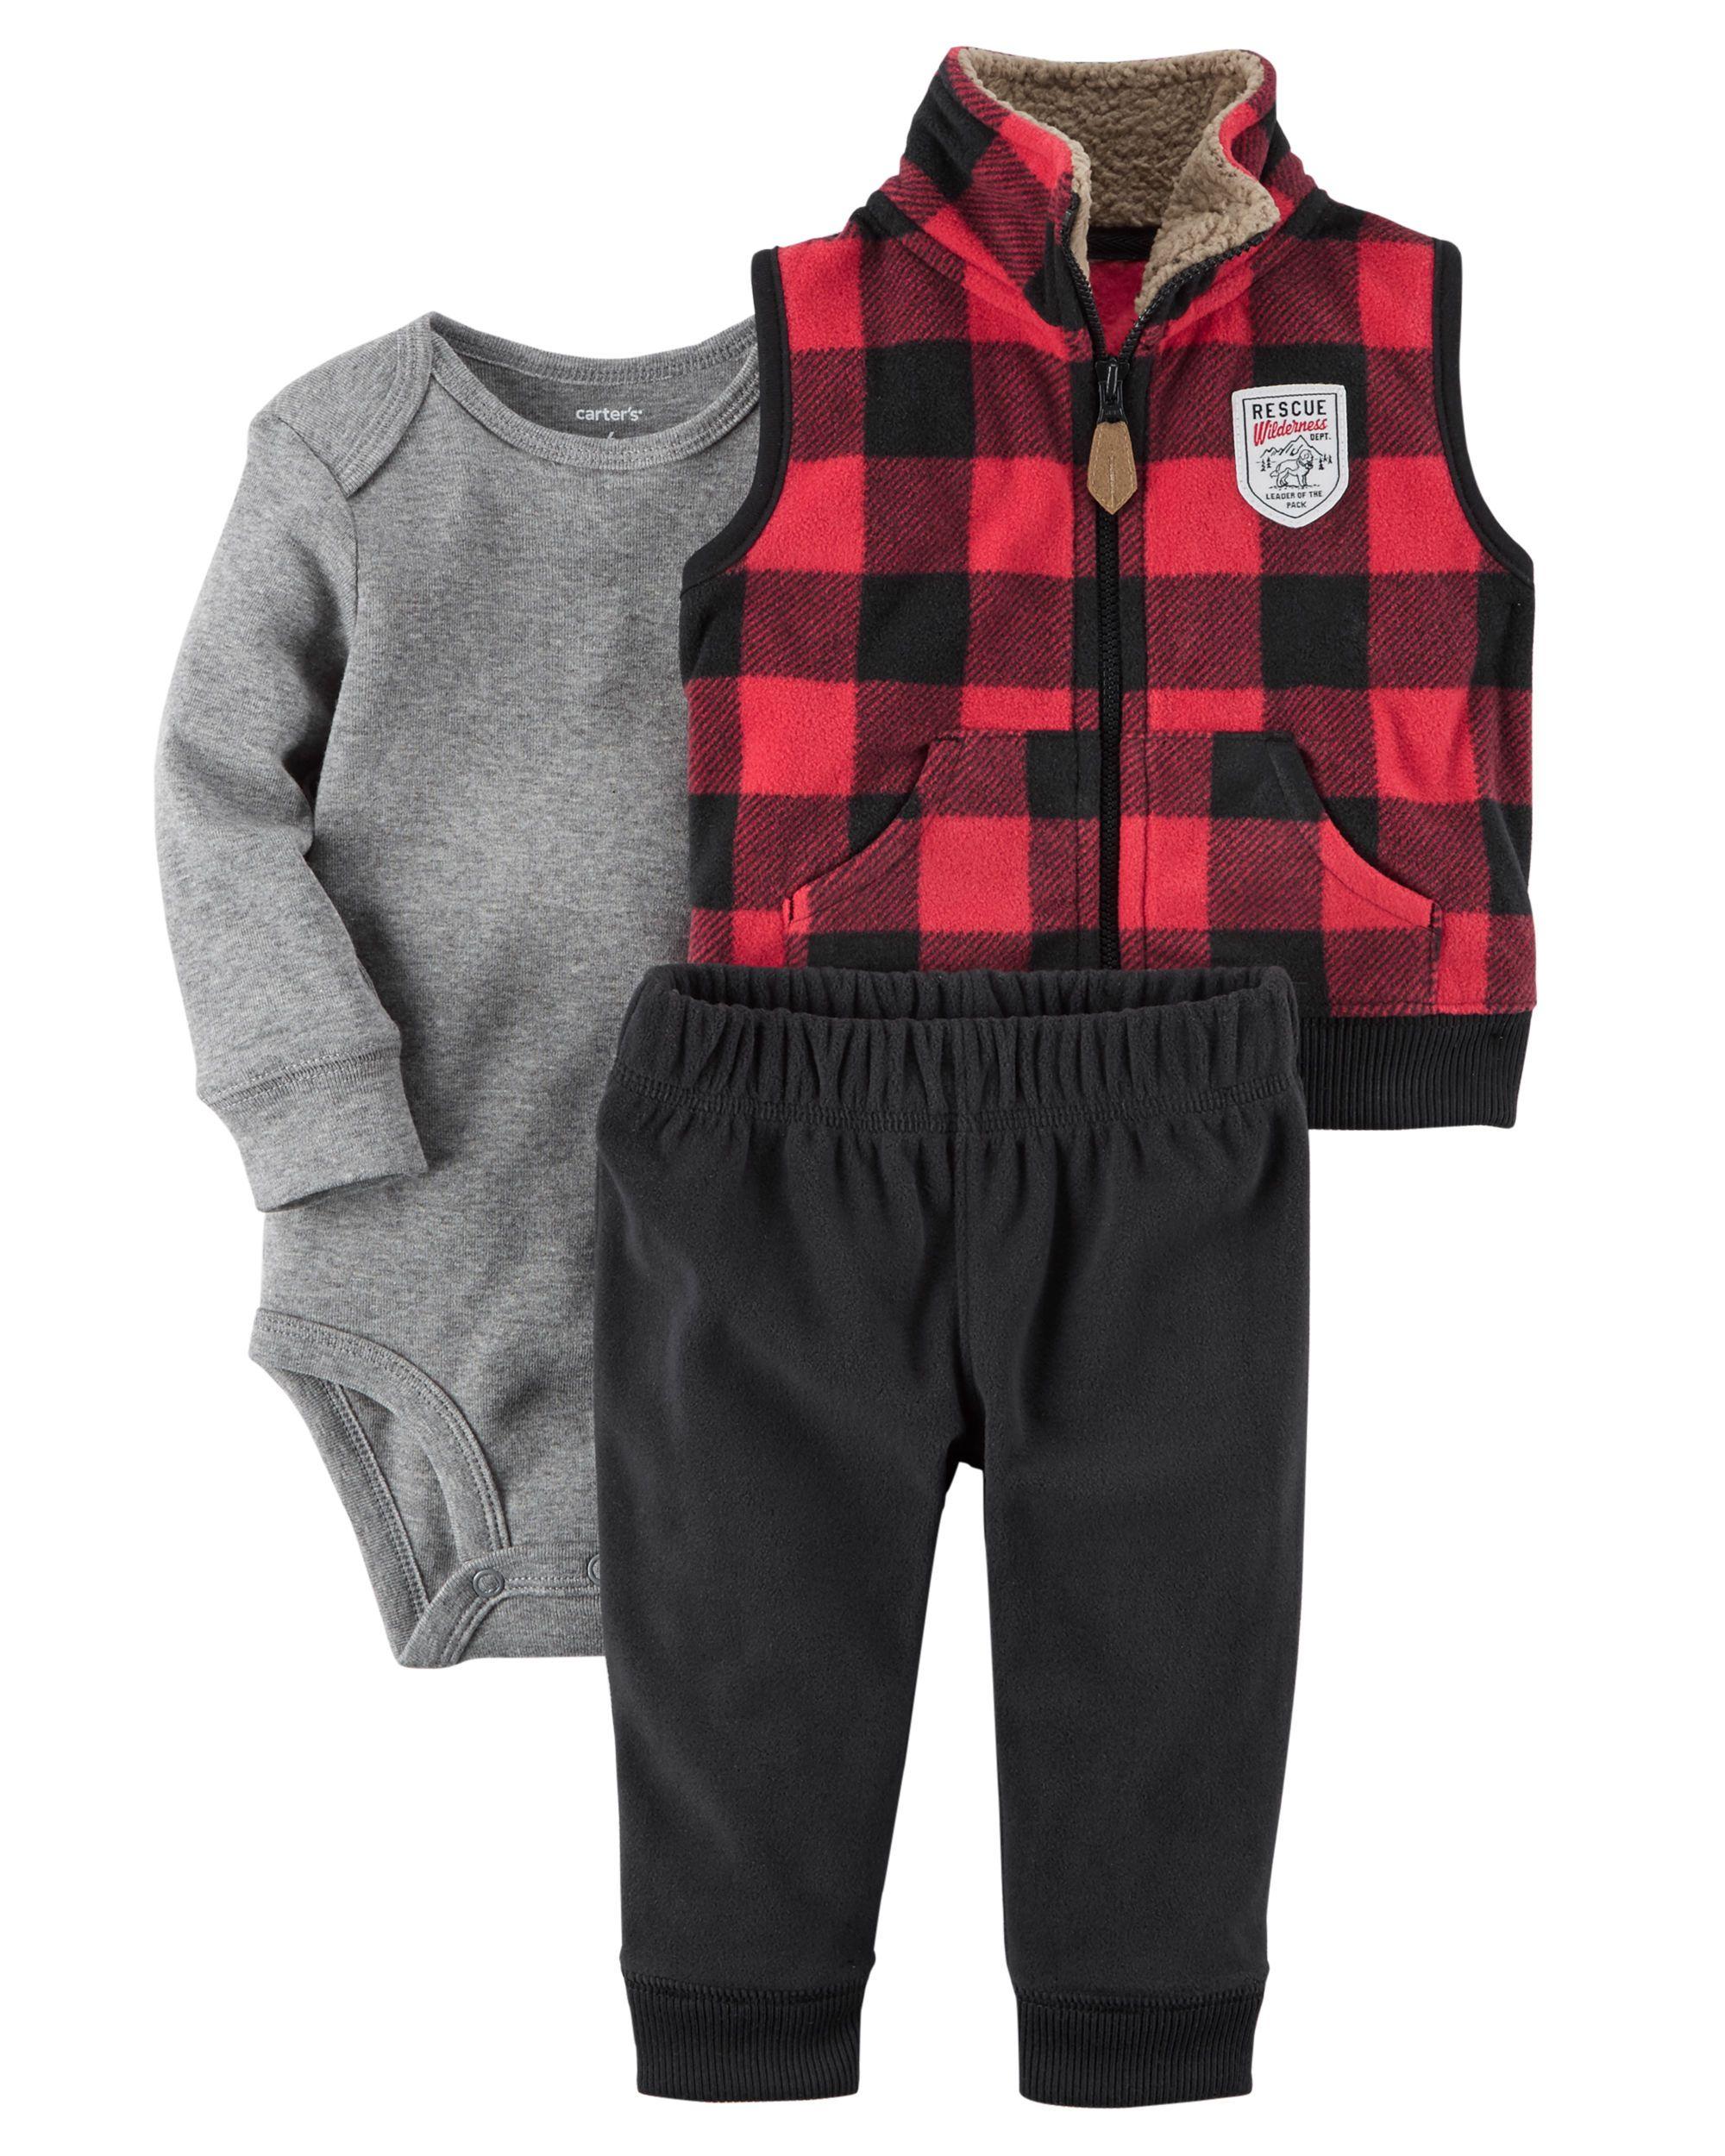 1dcc6329e2b Baby Boy 3-Piece Little Jacket Set